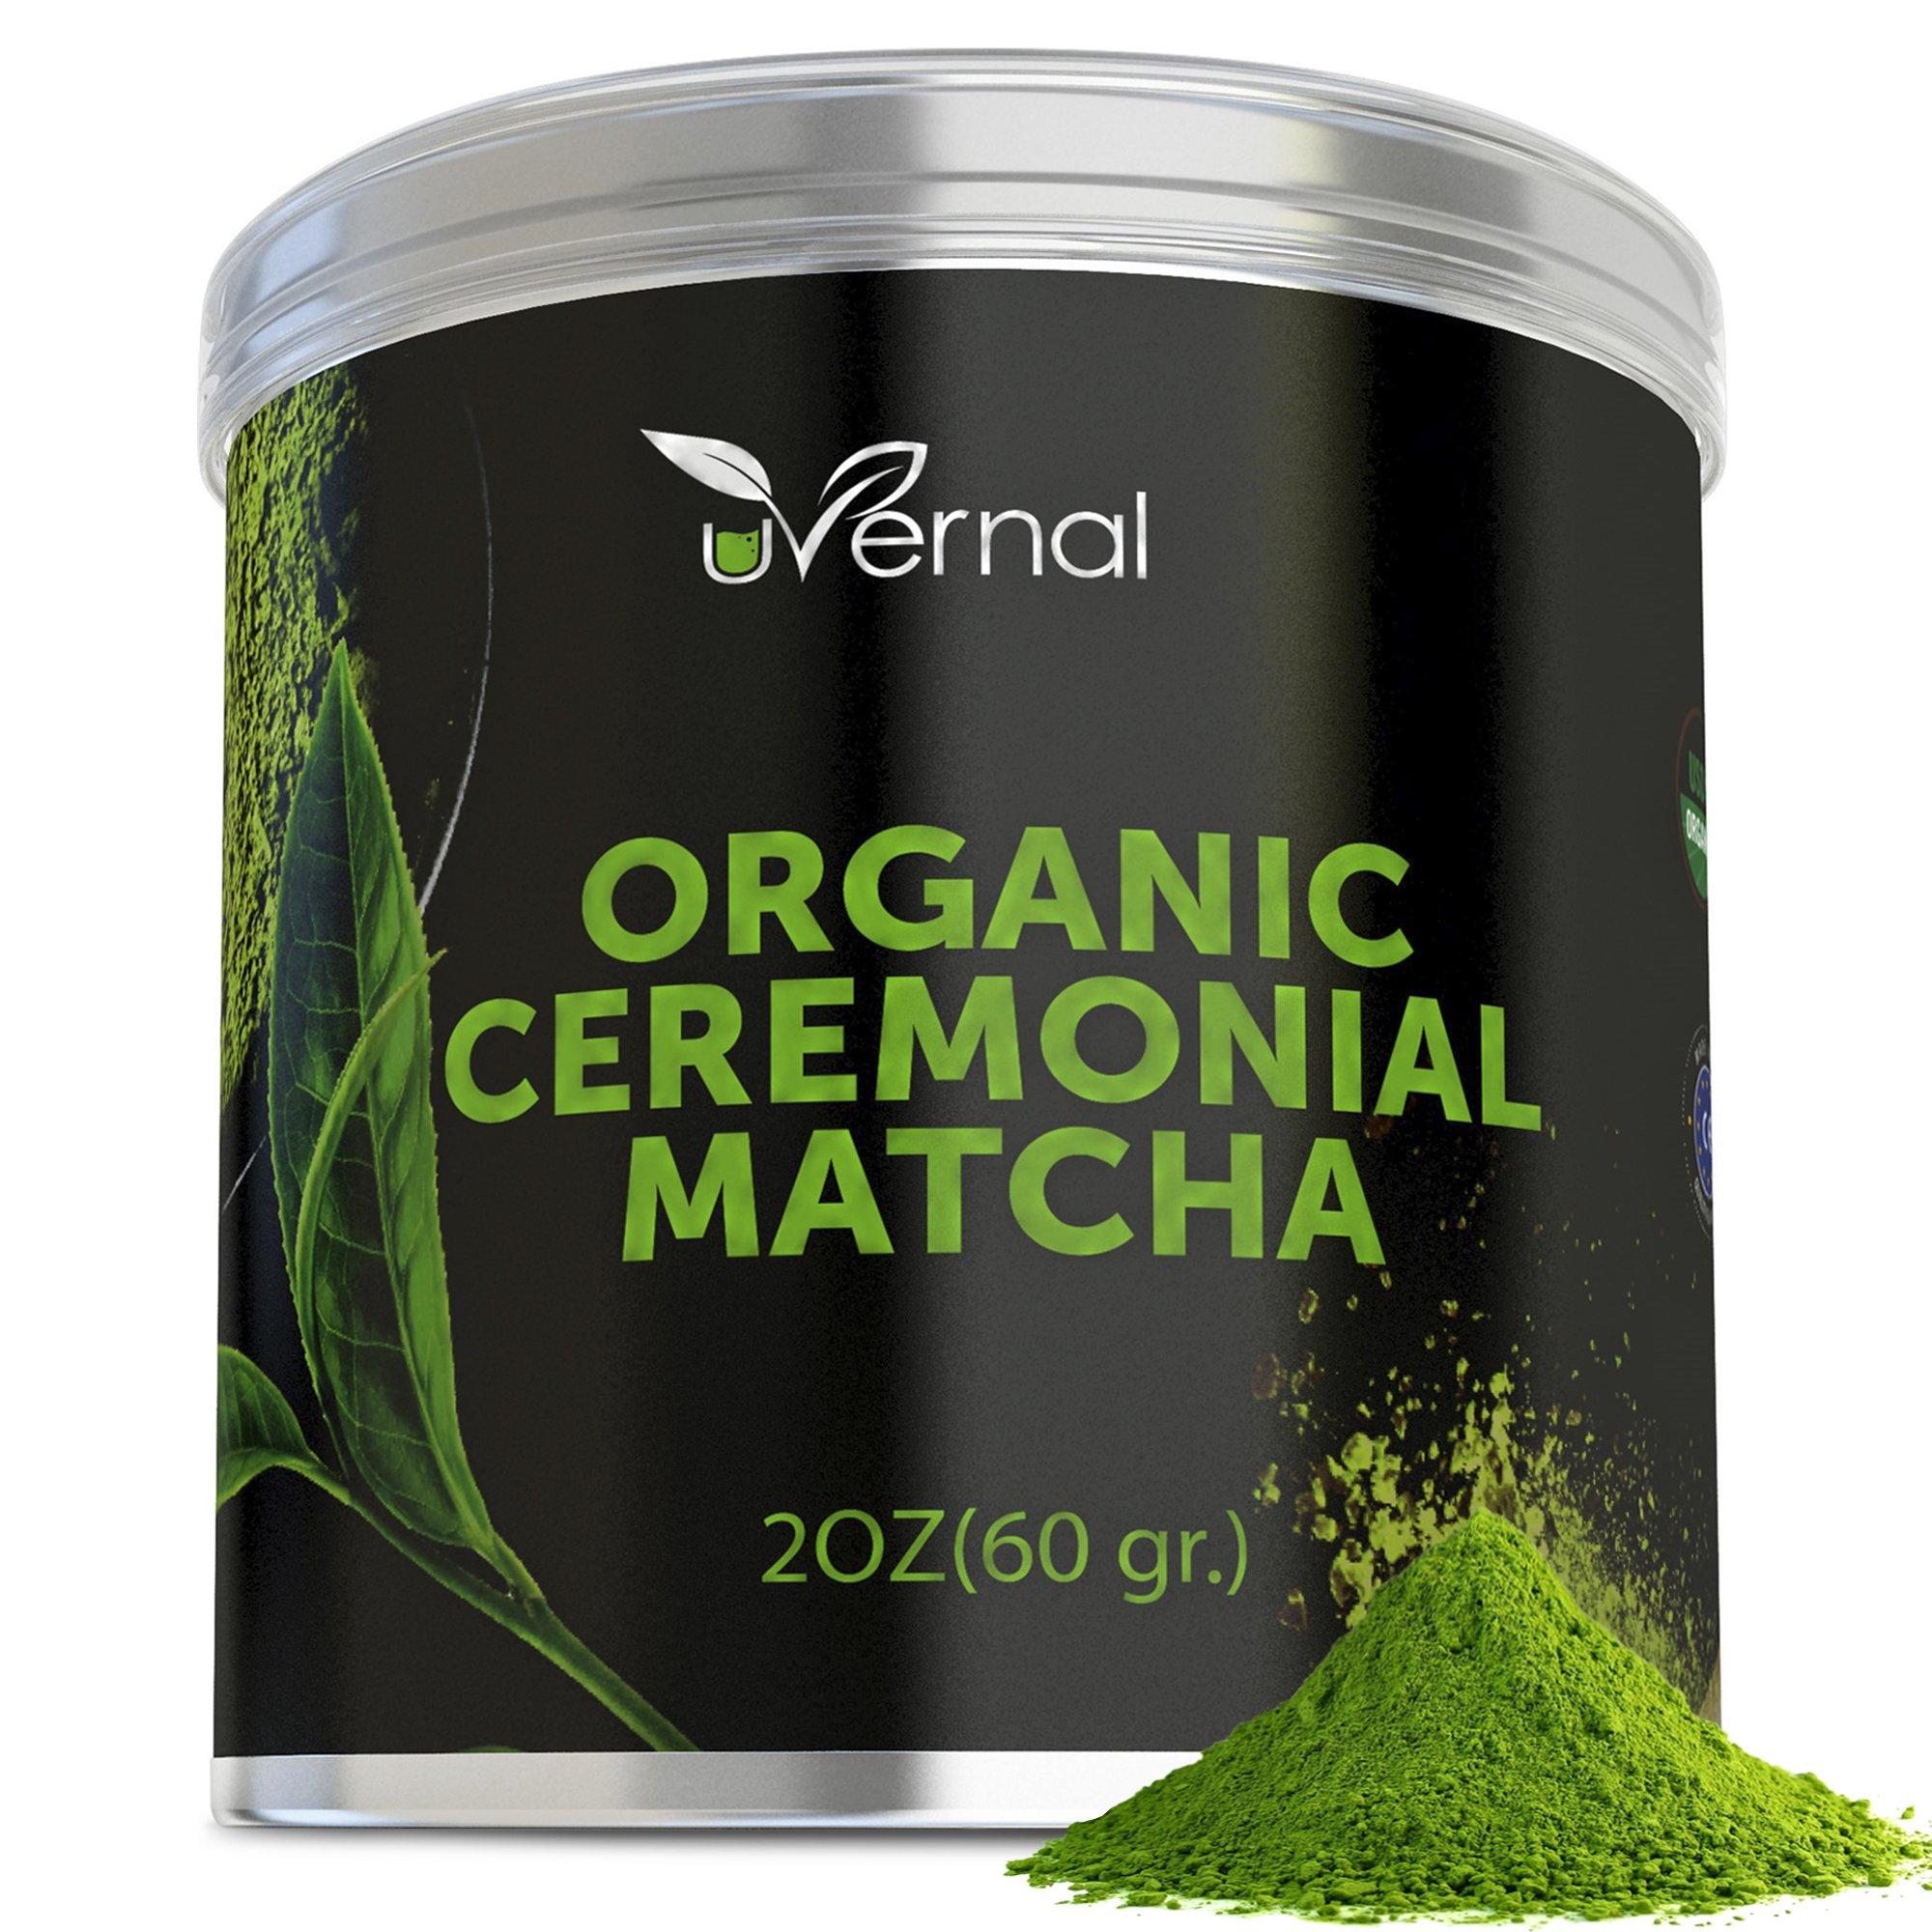 Organic Matcha Green Tea Powder - 100% Pure Matcha (No Sugar Added - Unsweetened Pure Green Tea - No Coloring Added Like Others) (CEREMONIAL)